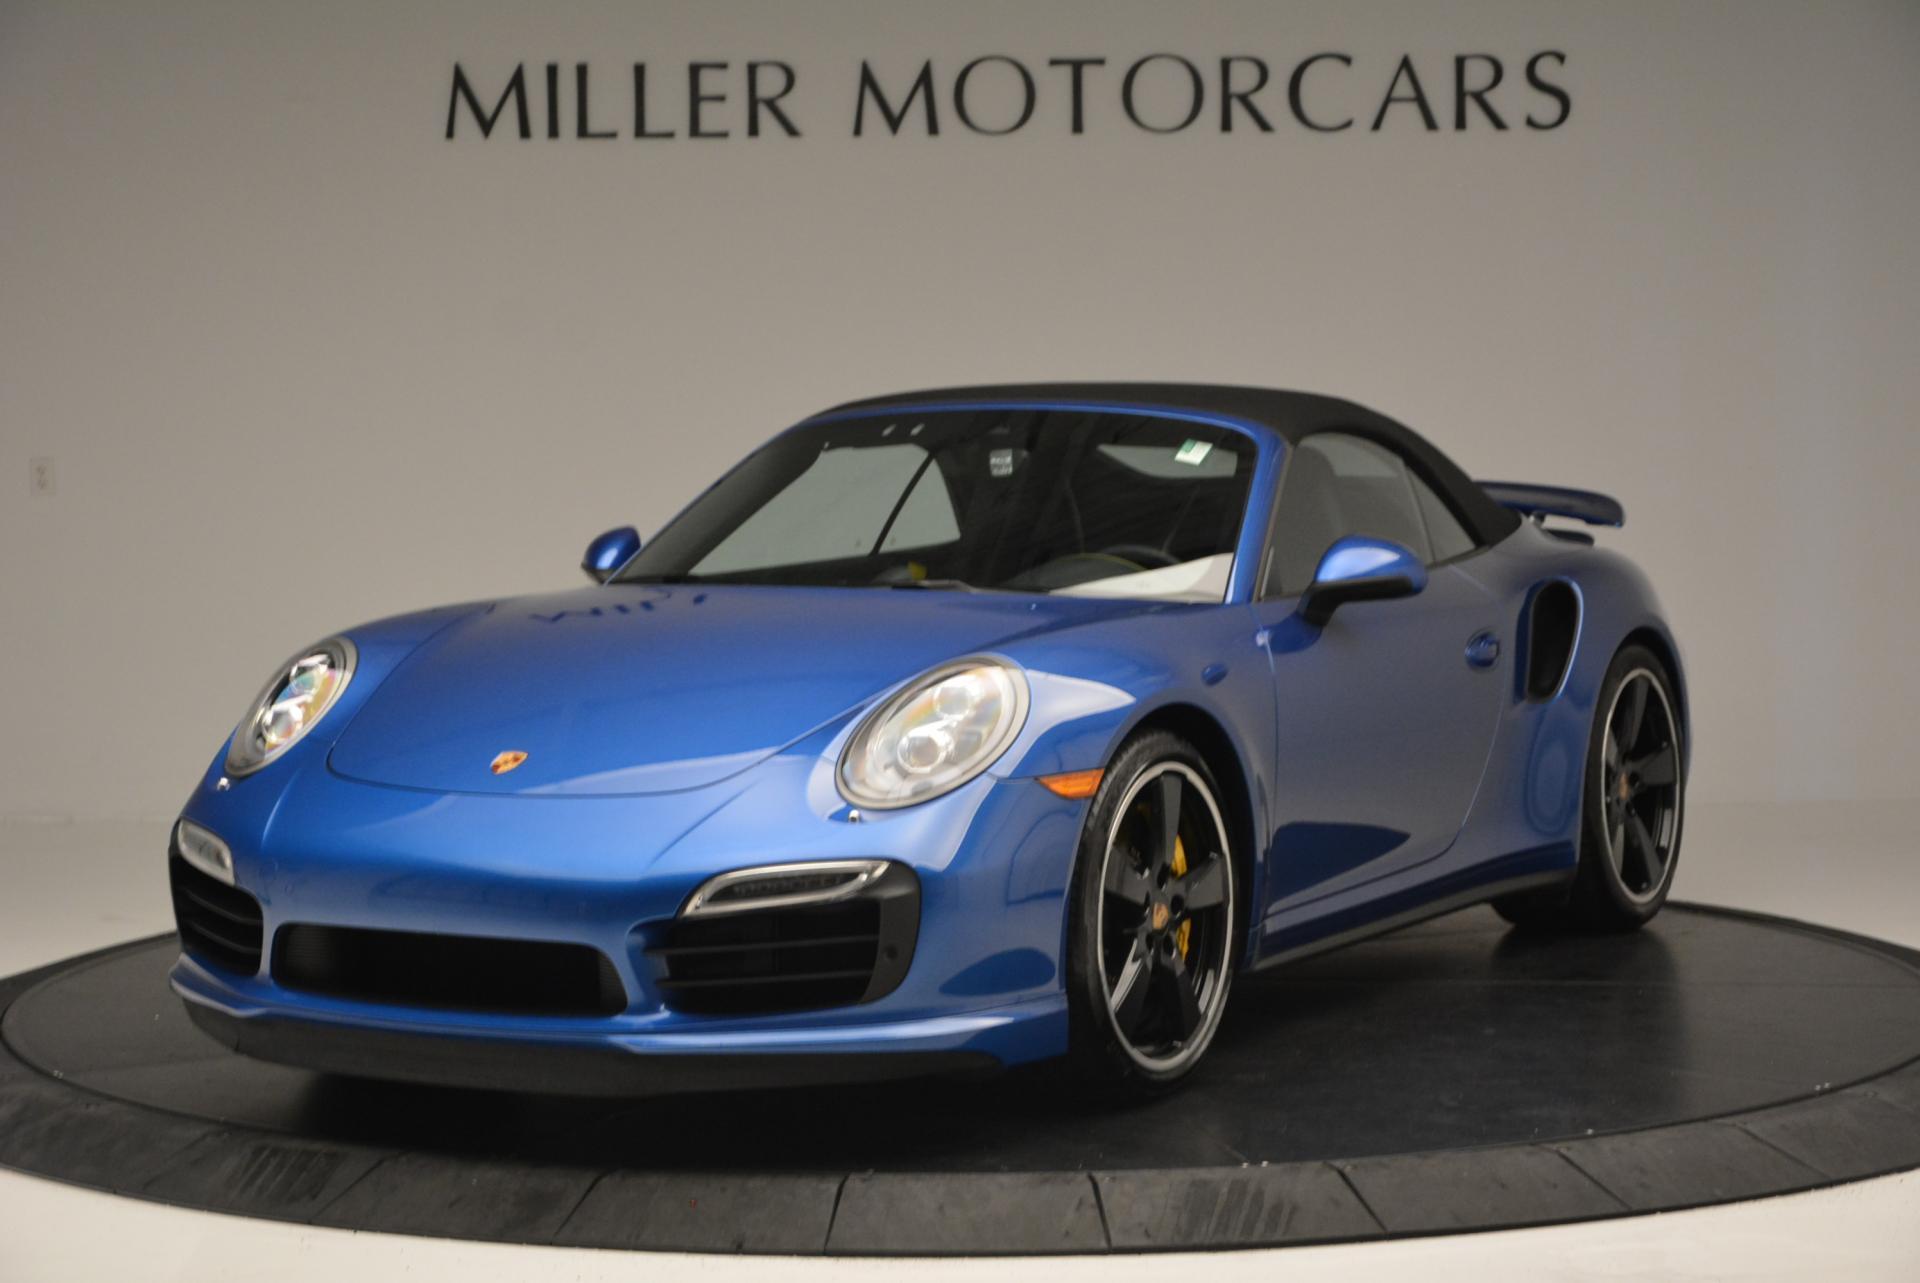 Used 2014 Porsche 911 Turbo S For Sale In Greenwich, CT 105_p13